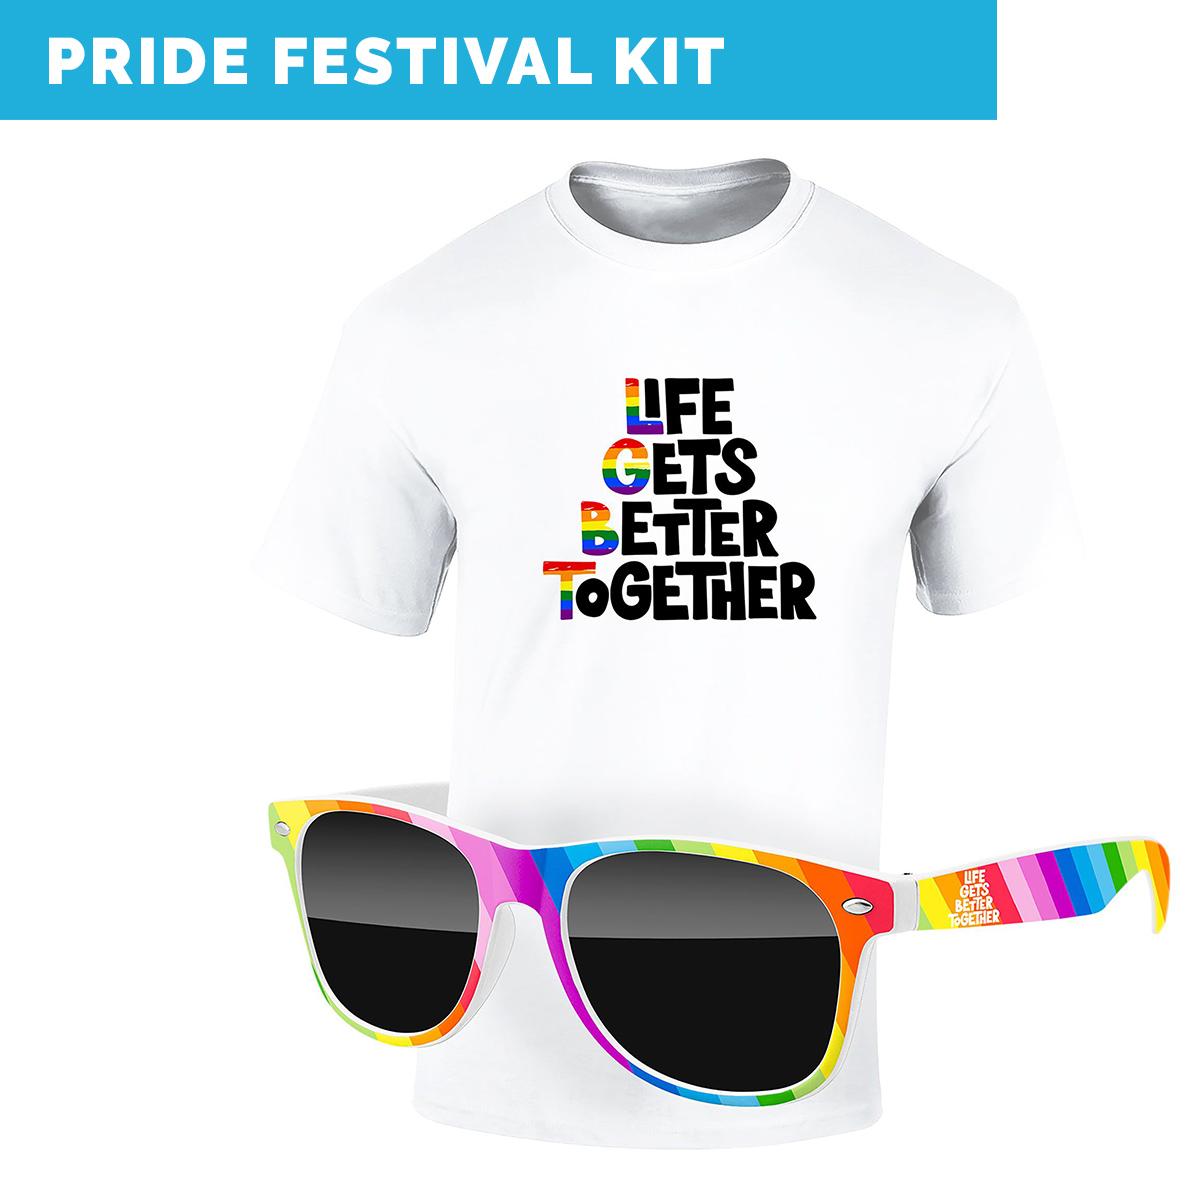 virtual pride festival kit includes custom printable t-shirt and rainbow sunglasses